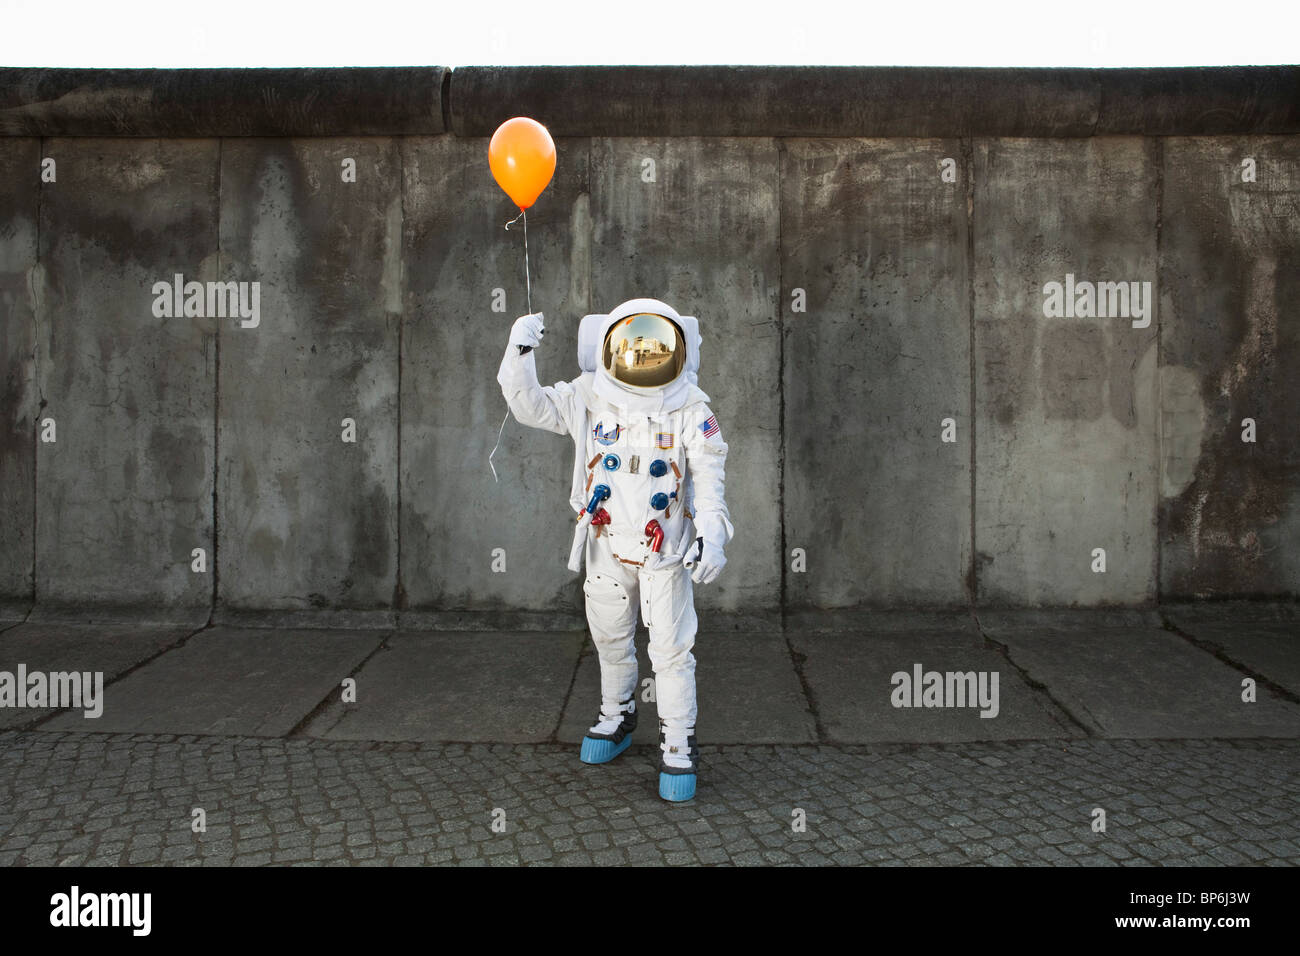 An astronaut on a city sidewalk holding a balloon Stock Photo